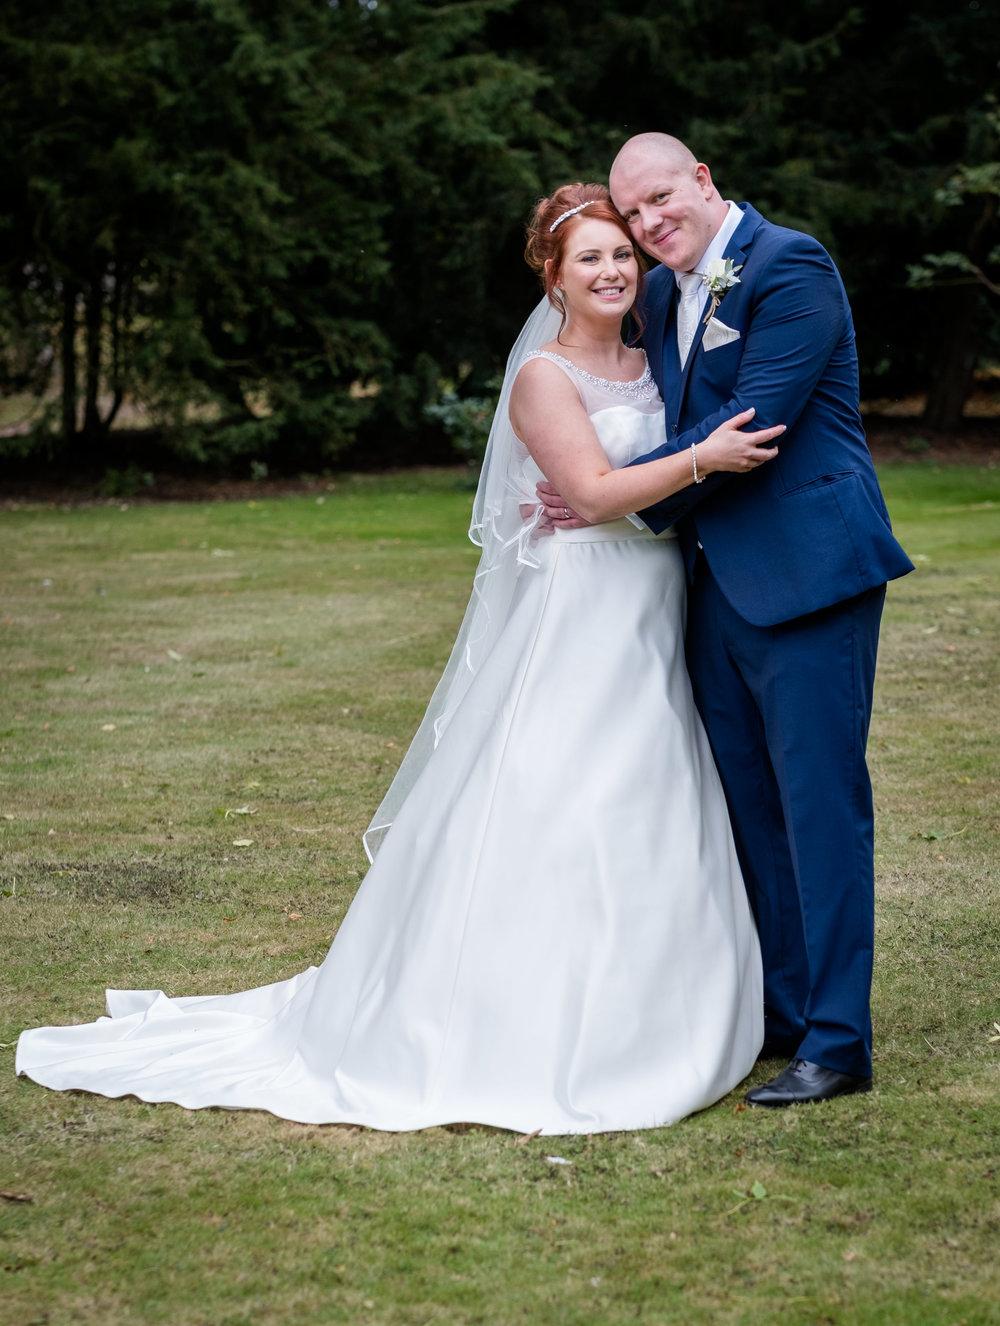 Mulberry House wedding photographer, Mulberry House wedding photographs